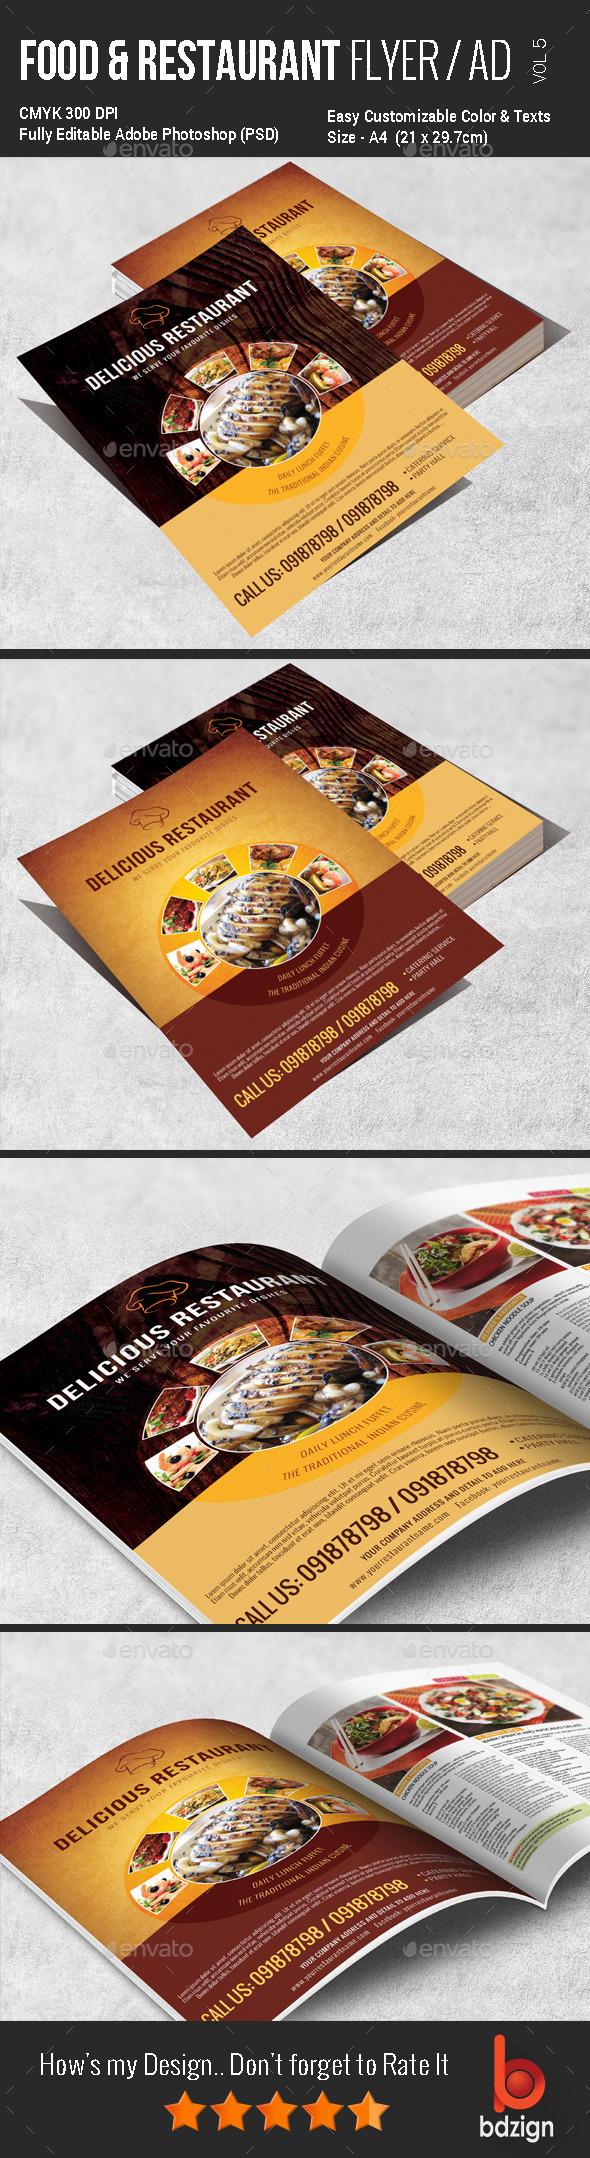 Multi Purpose Food Flyer - Vol5